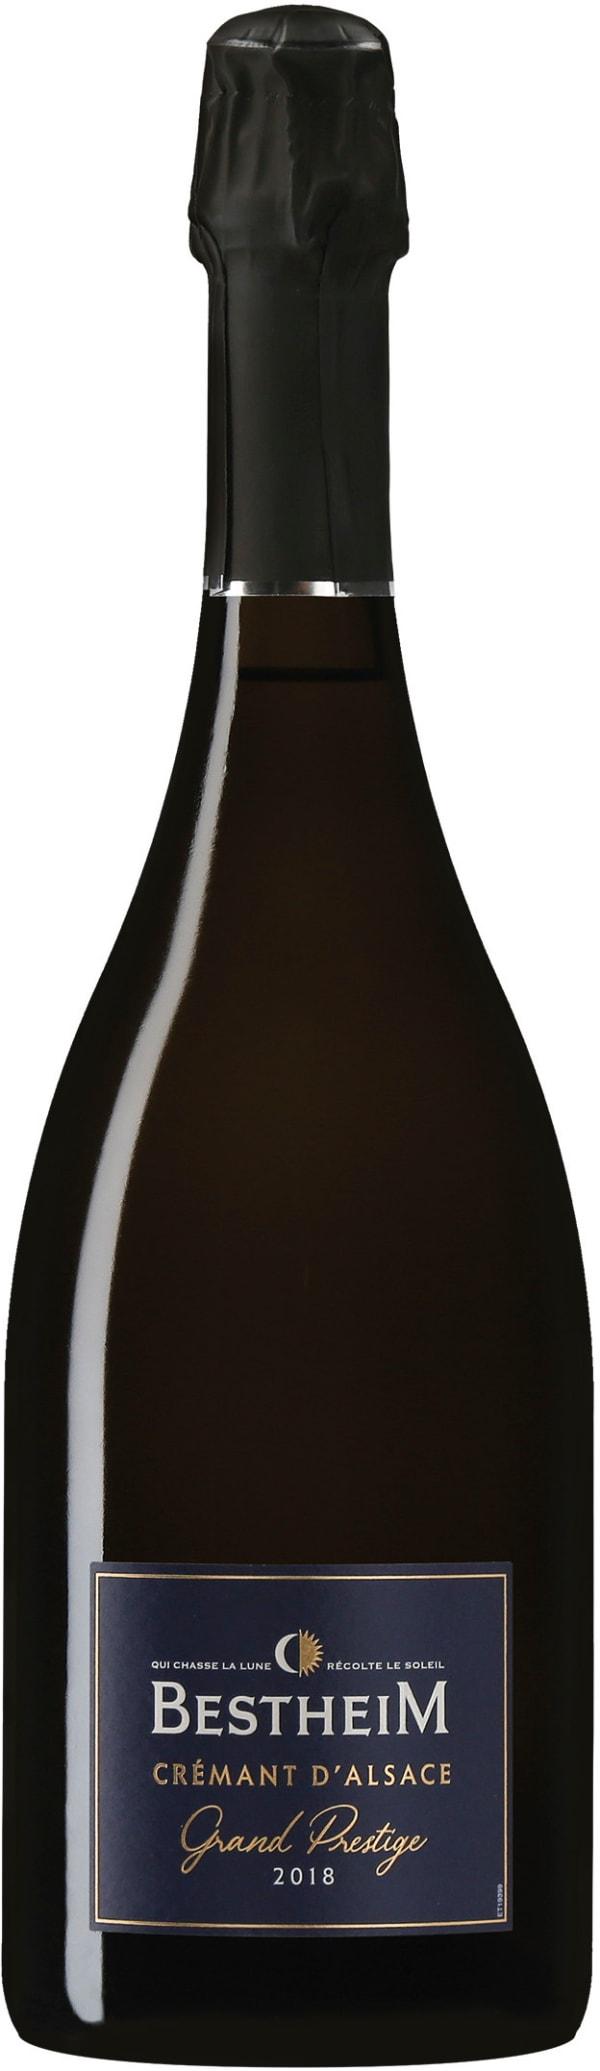 Bestheim Grand Prestige Crémant d'Alsace Brut 2012